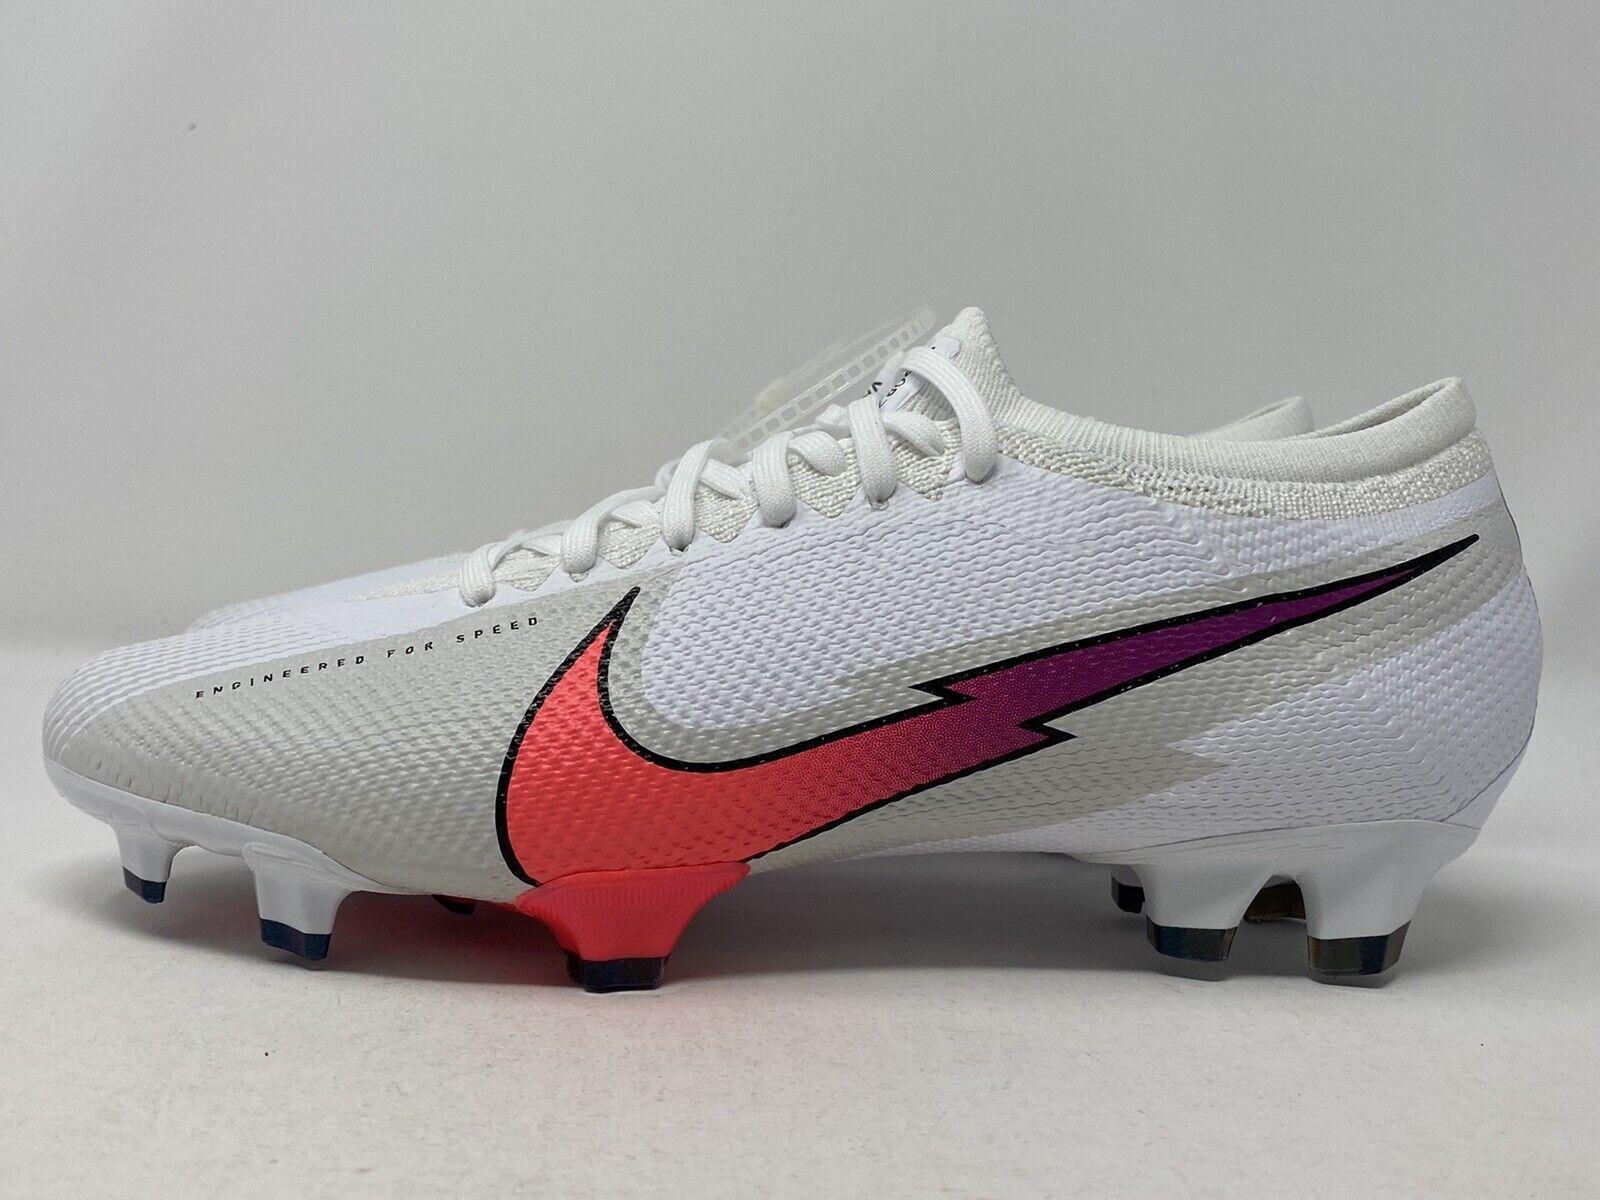 Novia Palabra Duque  Nike Mercurial Vapor VIII CR FG ACC Renaldo Soccer Cleats 538220 014 Size  7.5 for sale online | eBay